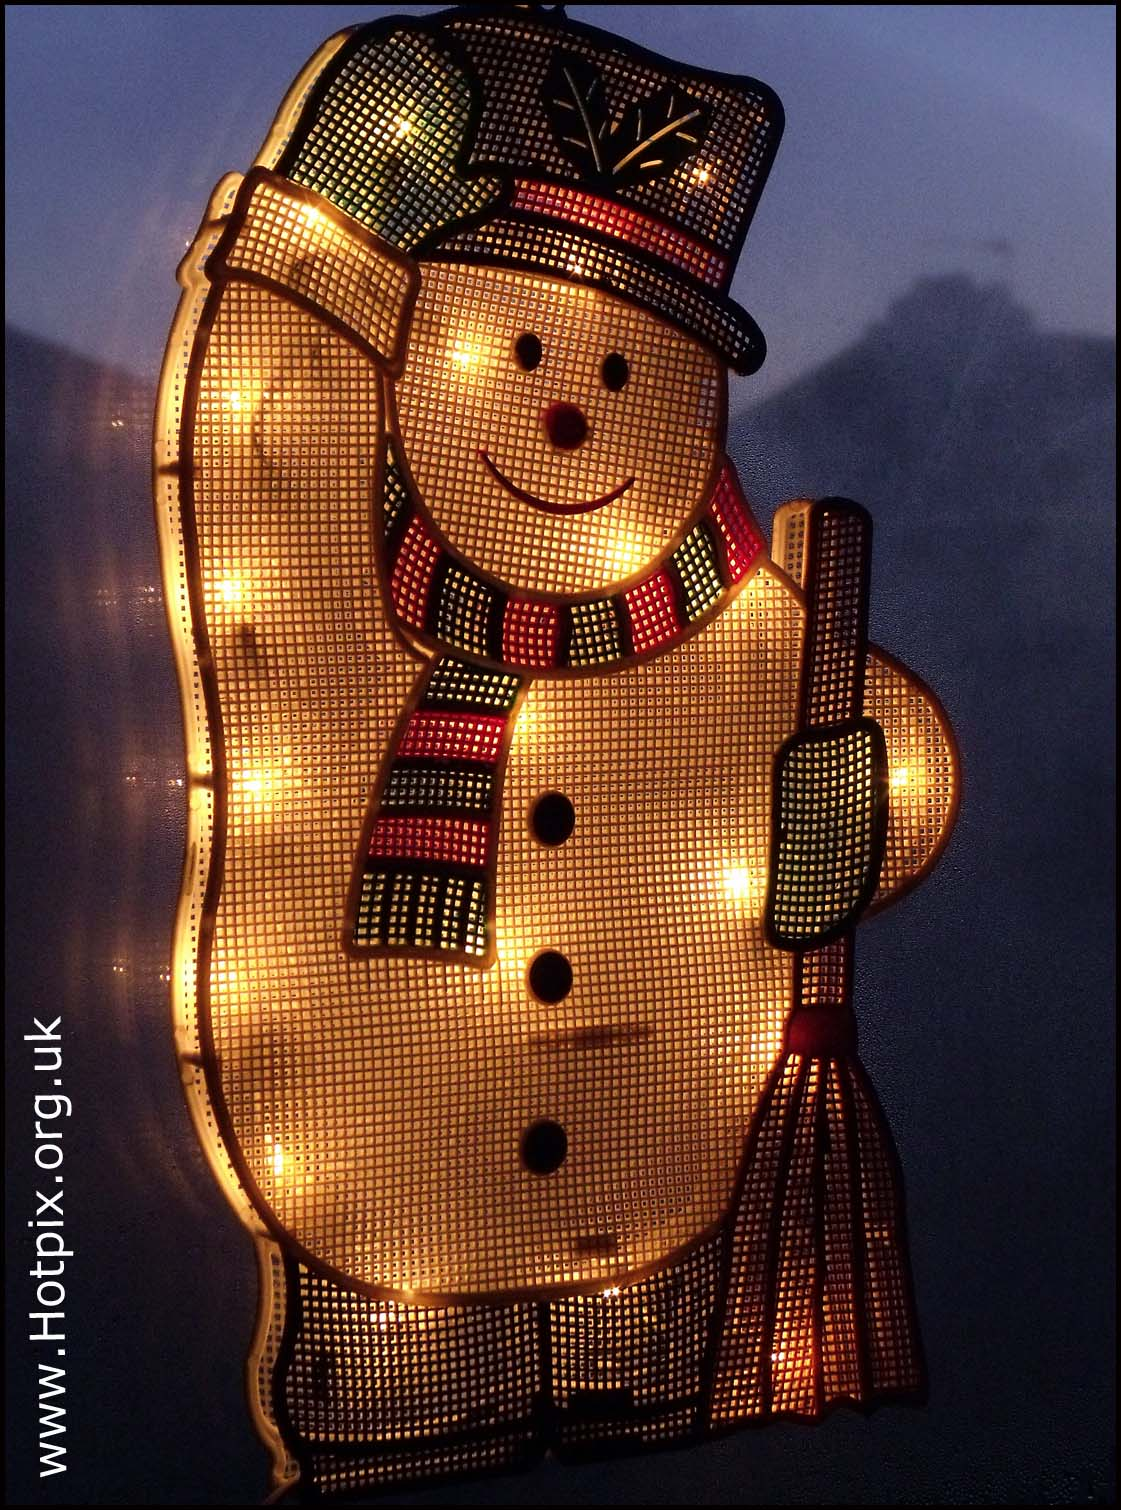 Christmas,decoration,snowman,electric,light,lights,window,dusk,bulb,tungstan,lit,up,lighted,friend,peace,peaceful,friendly,snow,winter,xmas,Yule,season,seasonal,tony,smith,tonysmith,hotpix,hotpixuk,tdk,tdktony,salute,saluting,broom,brush,\u96ea,sneeuw,neige,Schnee,\u0441\u043d\u0435\u0436\u043e\u043a,nieve,dark,disturbia,noche,nuit